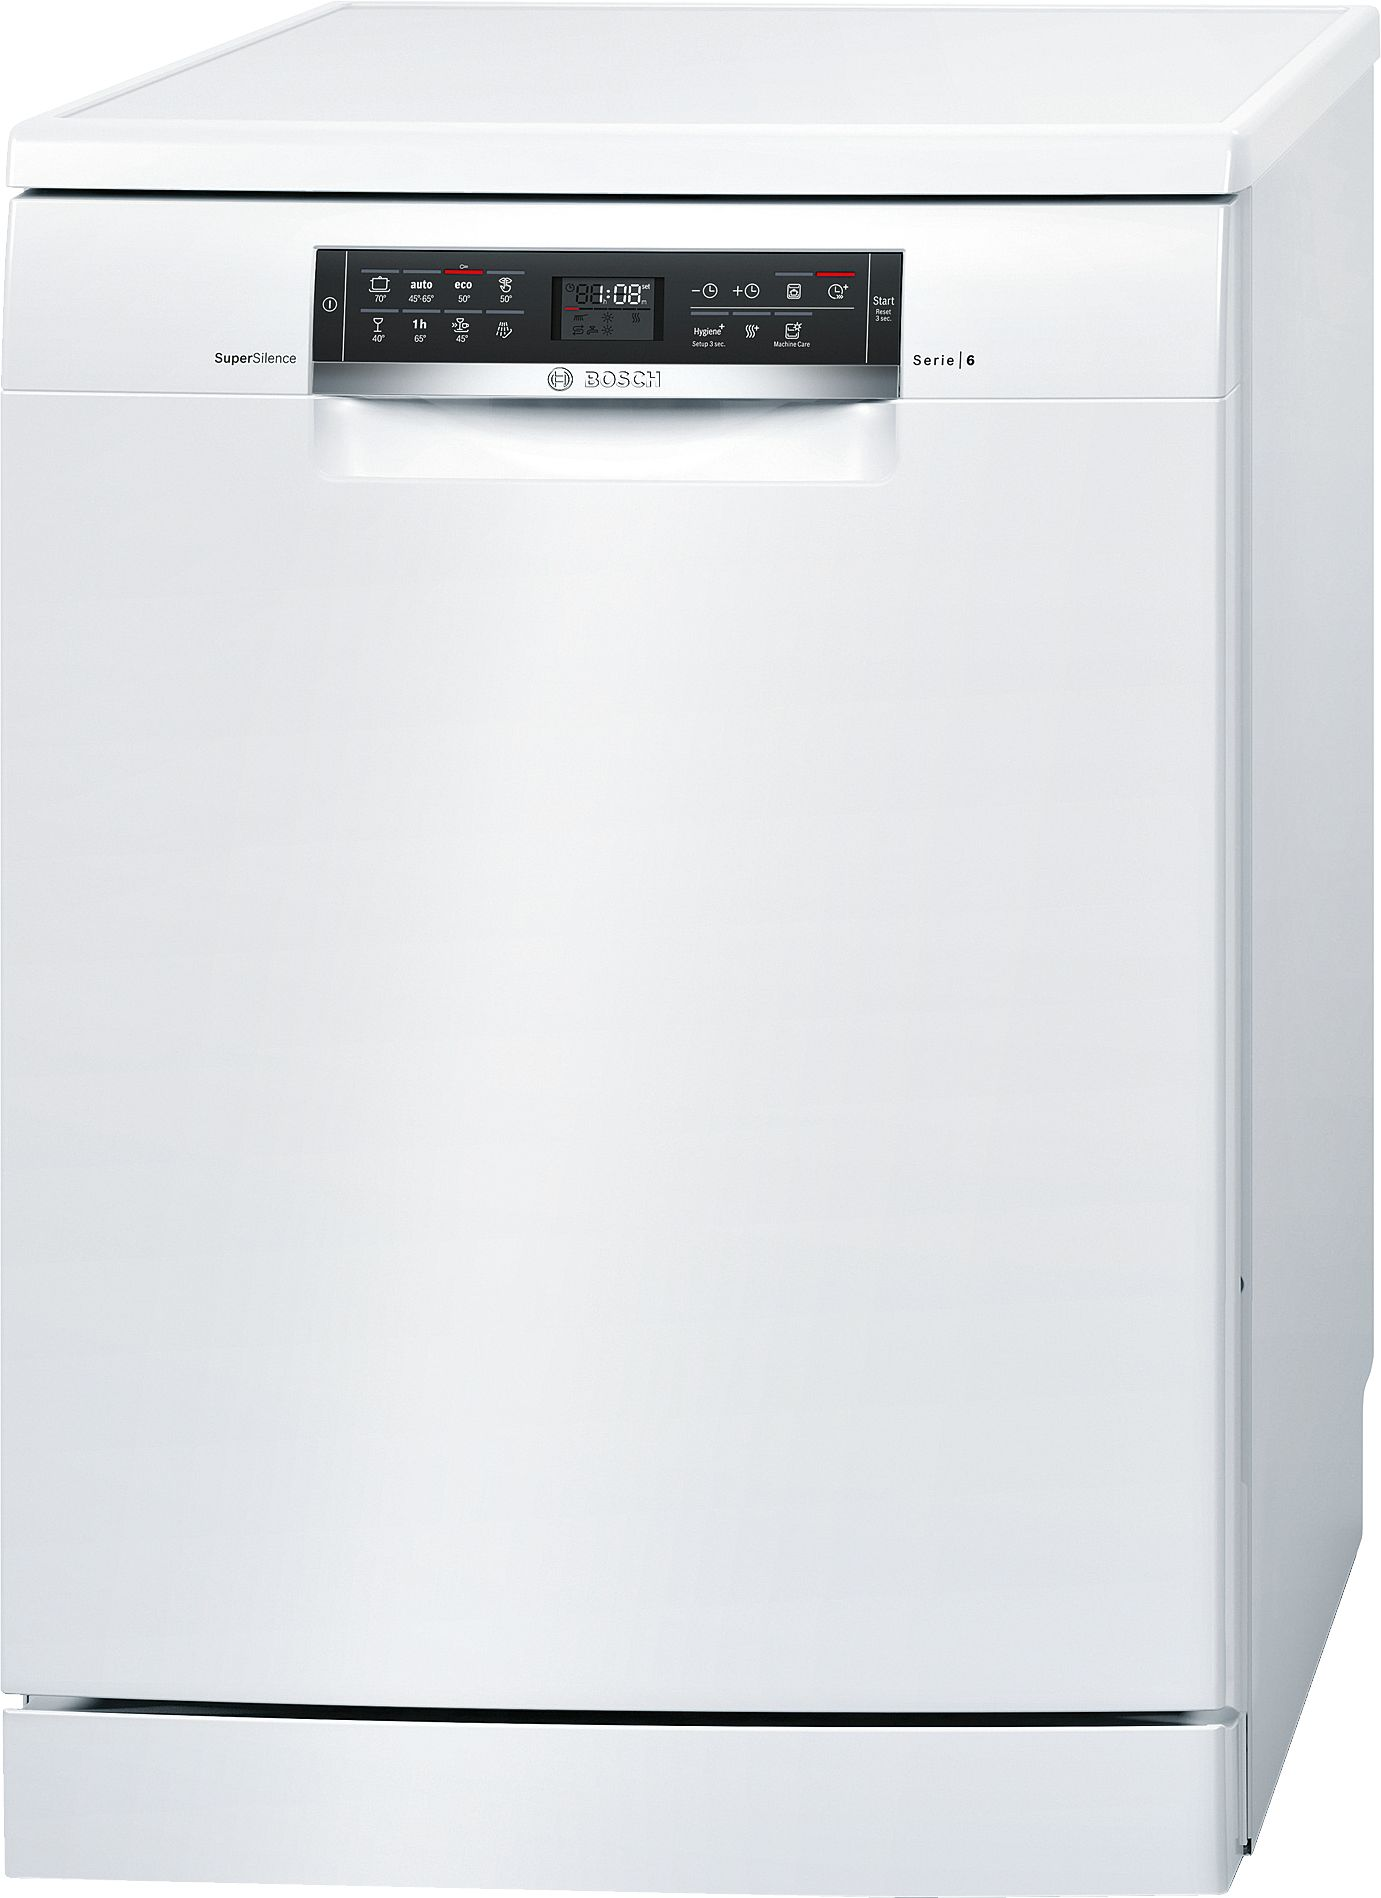 Serie | 6 SuperSilence mašina za pranje sudova, 60 cm samostalna mašina za pranje sudova, bela